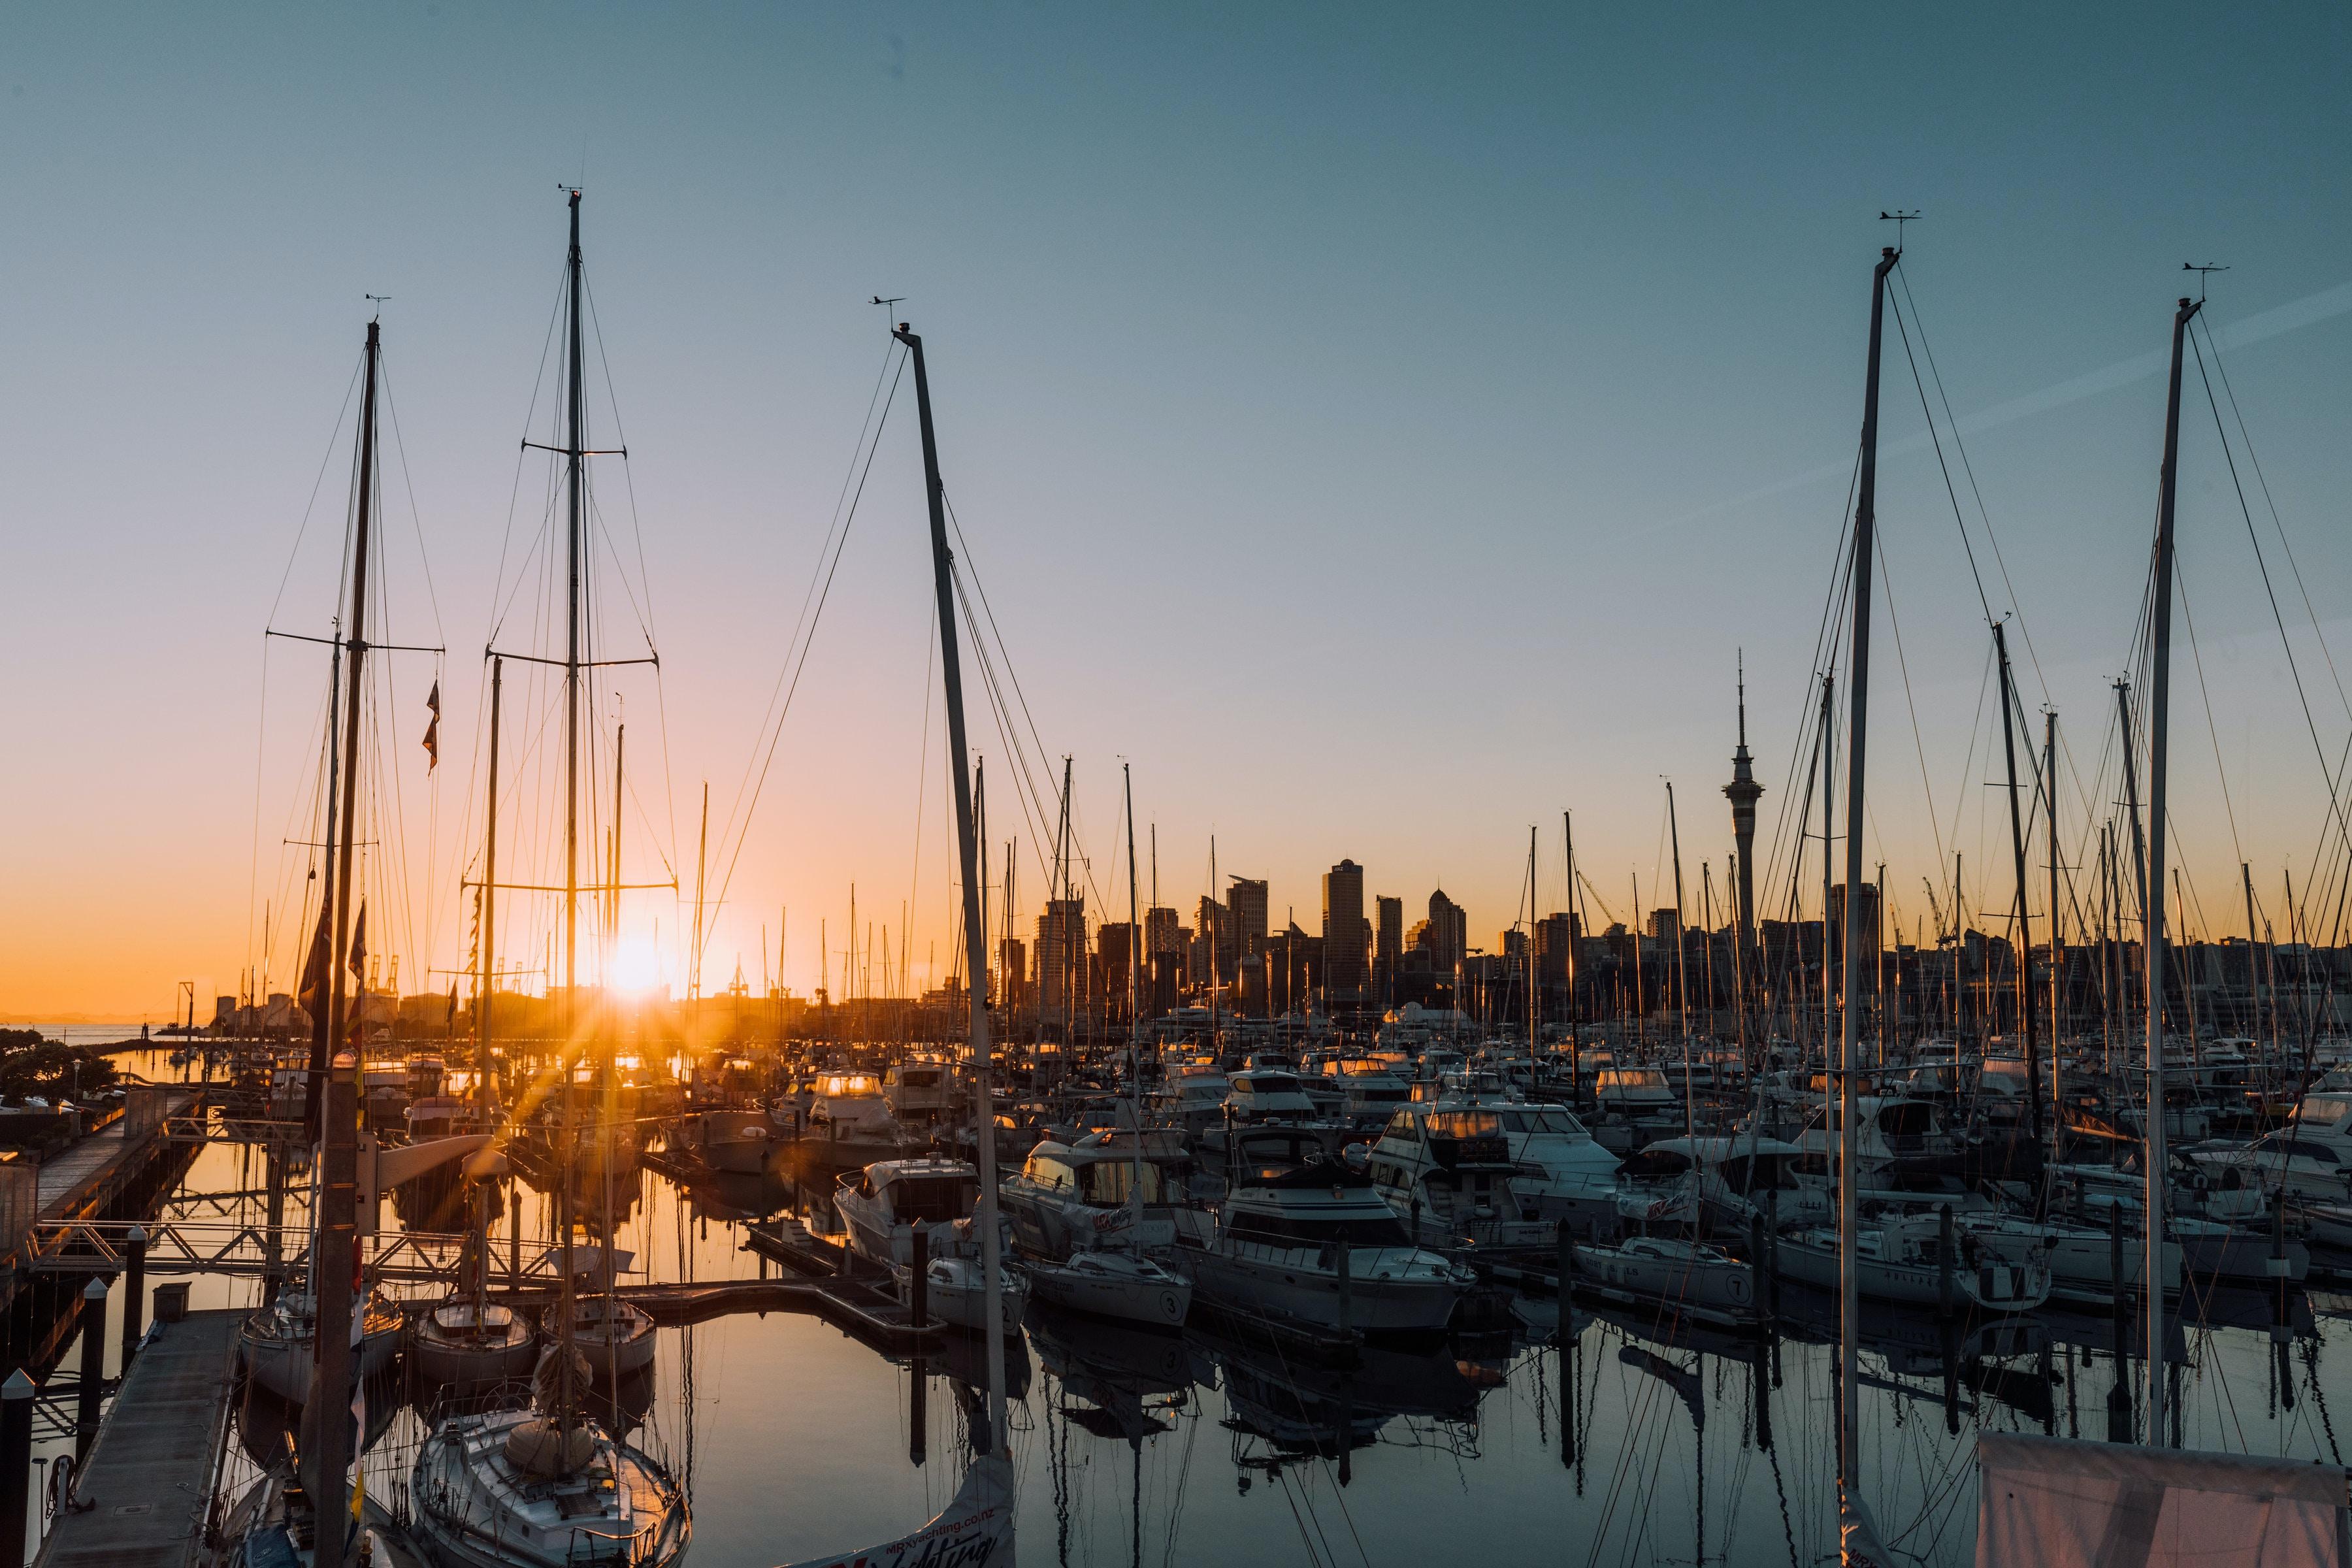 dock boats on the port during sundown